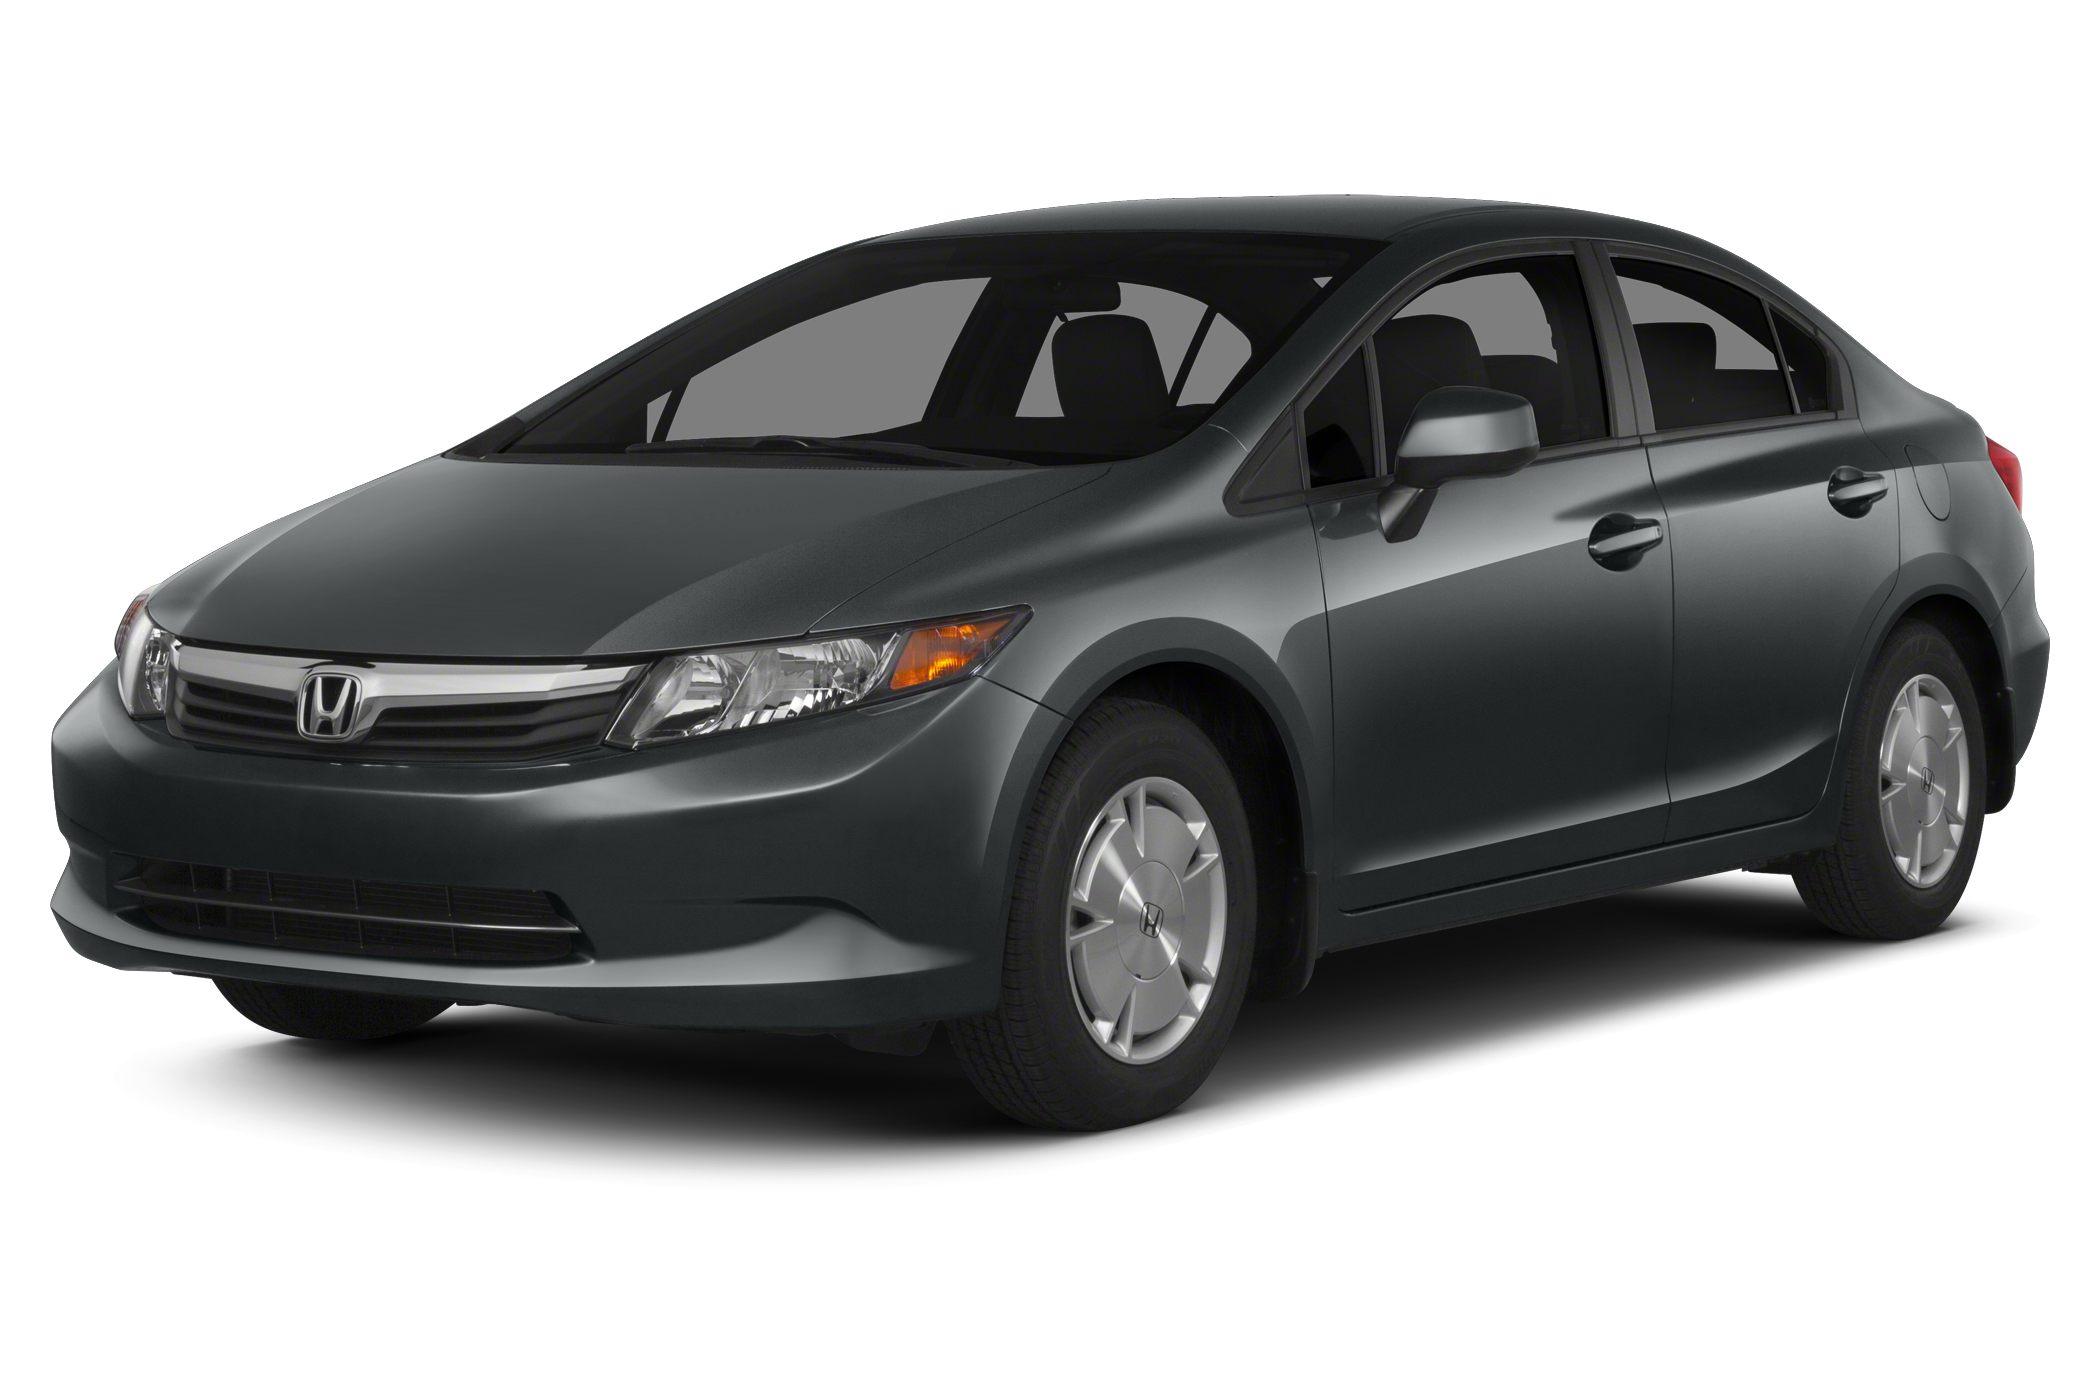 2012 Honda Civic Hybrid Base Sedan for sale in Houston for $16,991 with 23,264 miles.